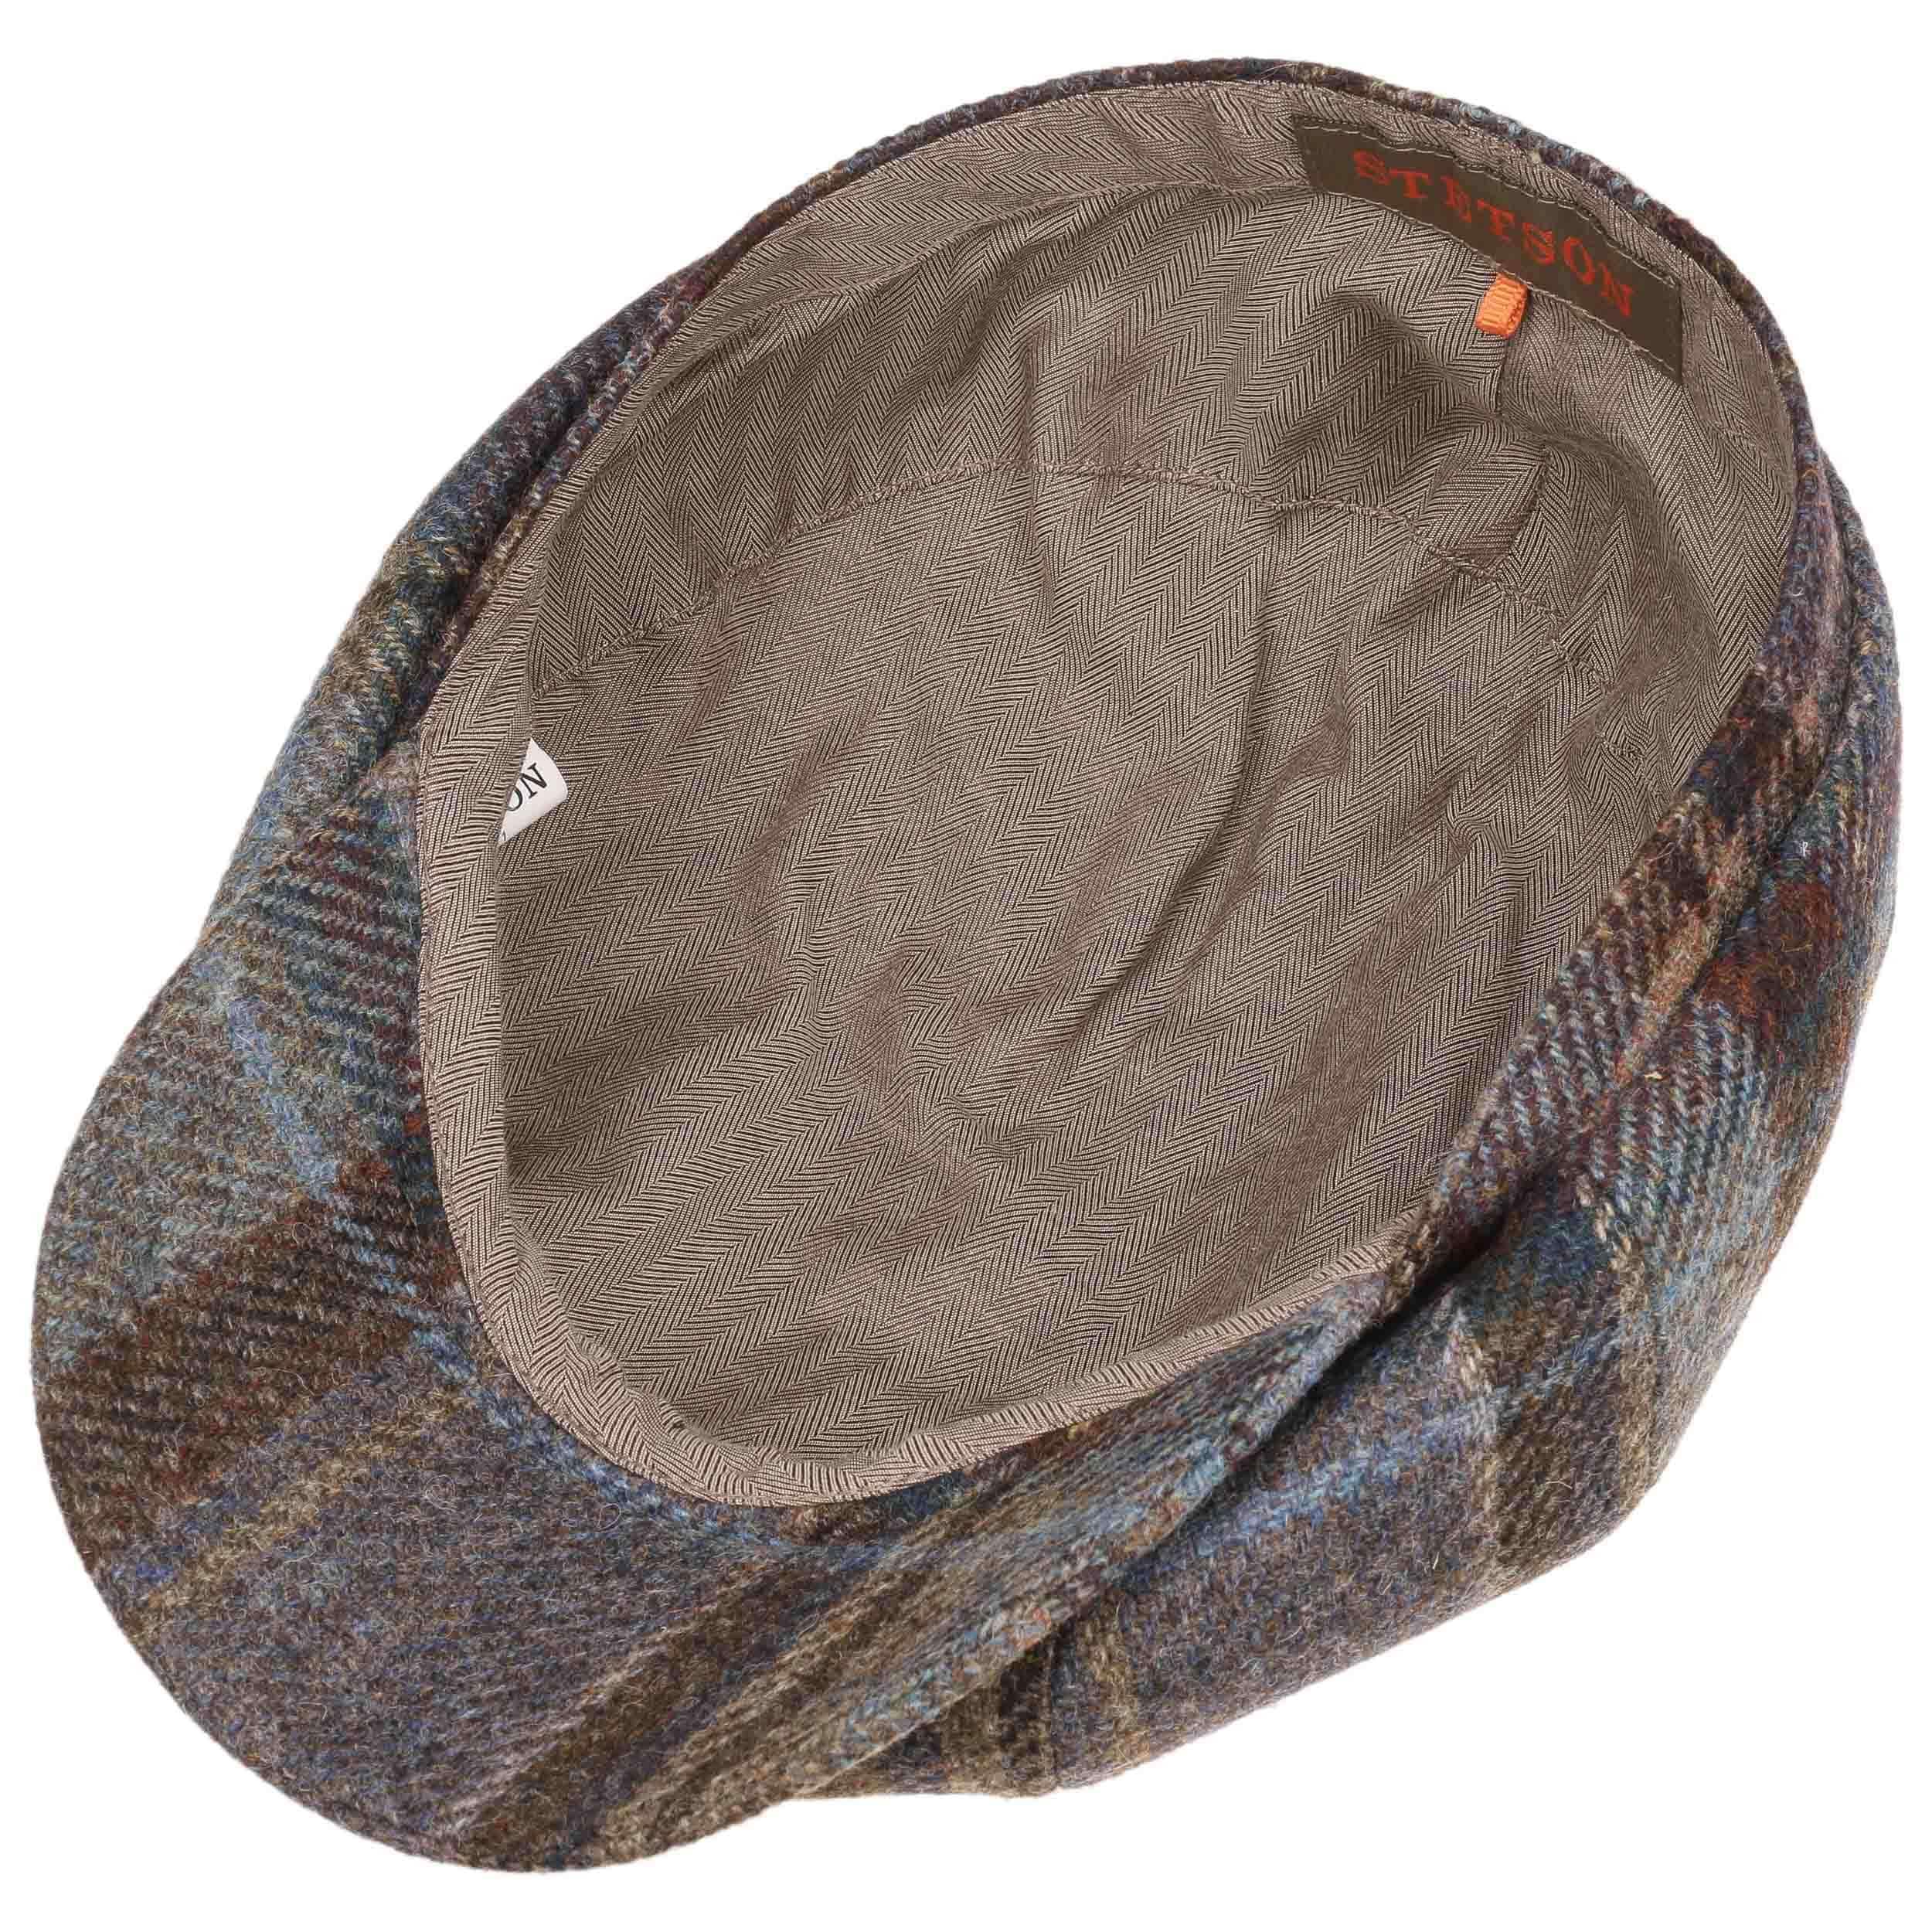 ... Hatteras Virgin Wool Check Cap by Stetson - blue 2 ... 2b90b8fc3a35